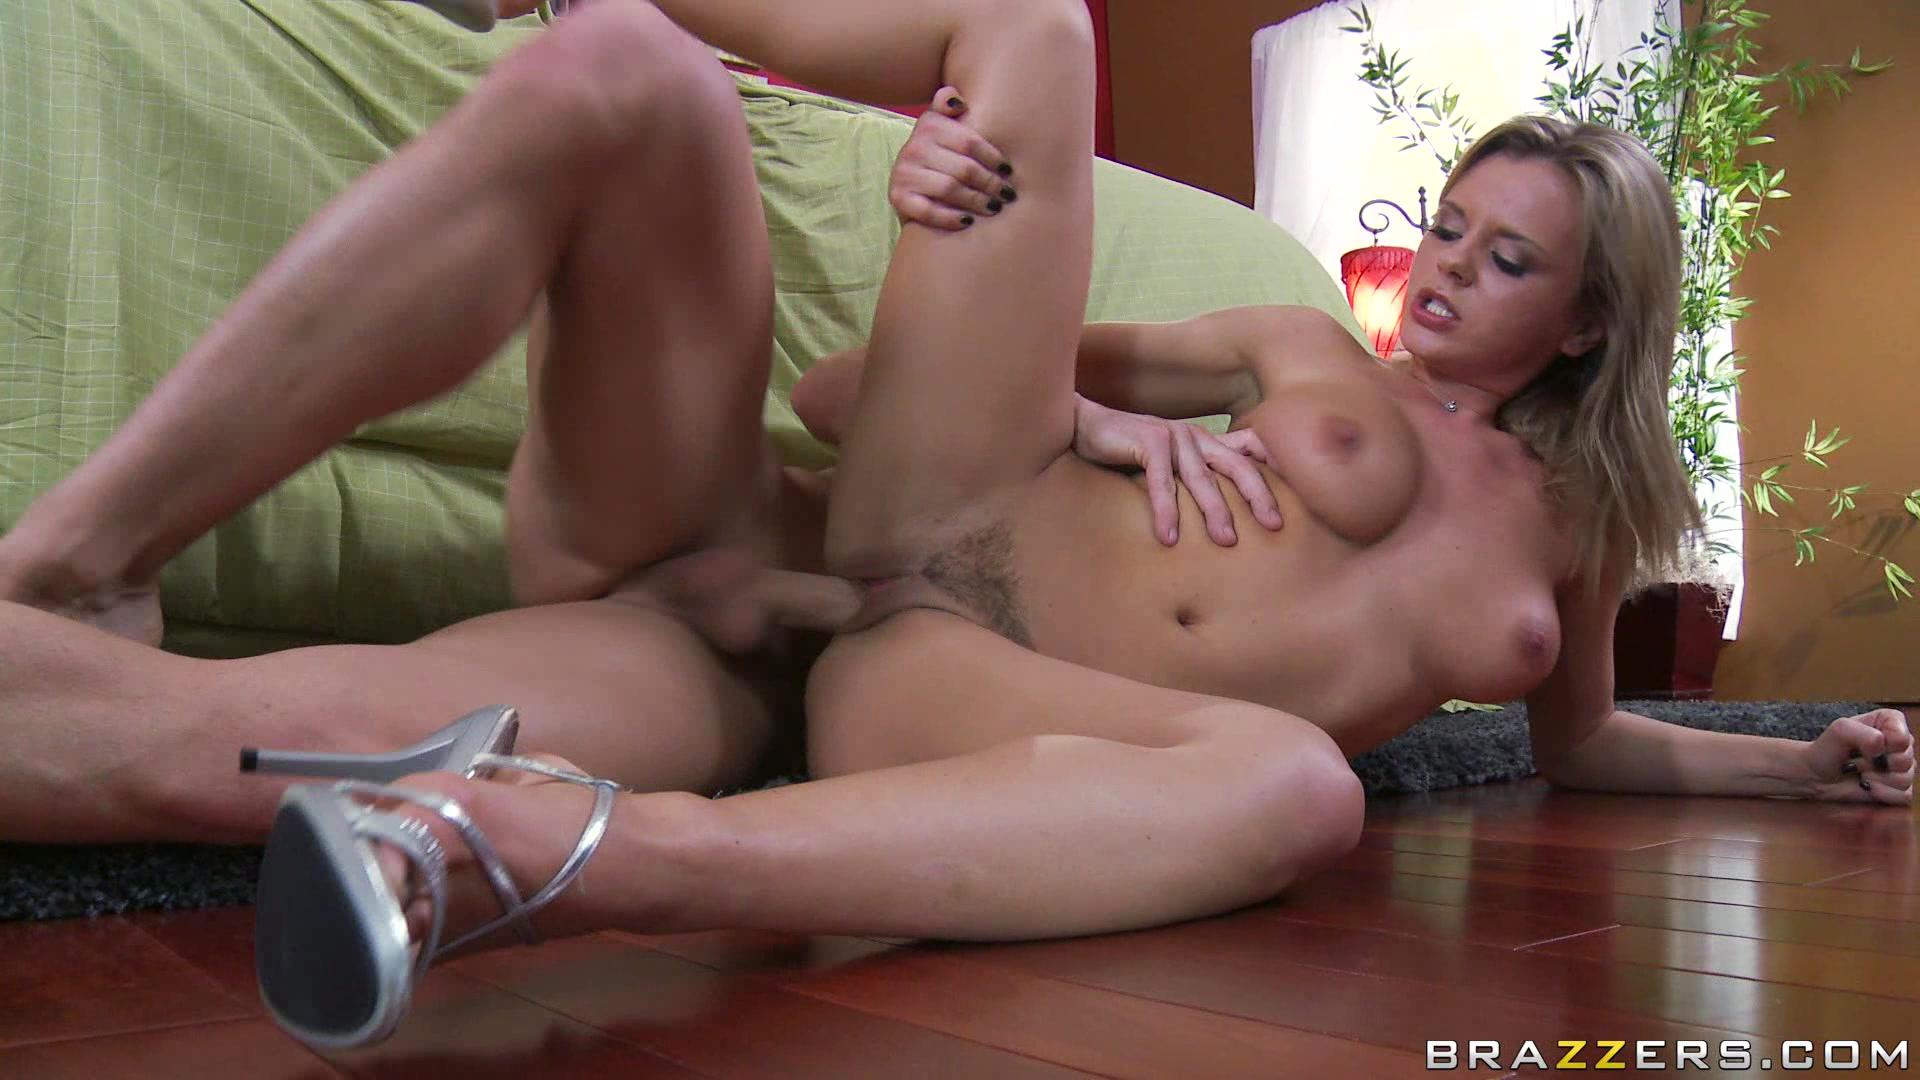 Смотреть порно онлайн 720р